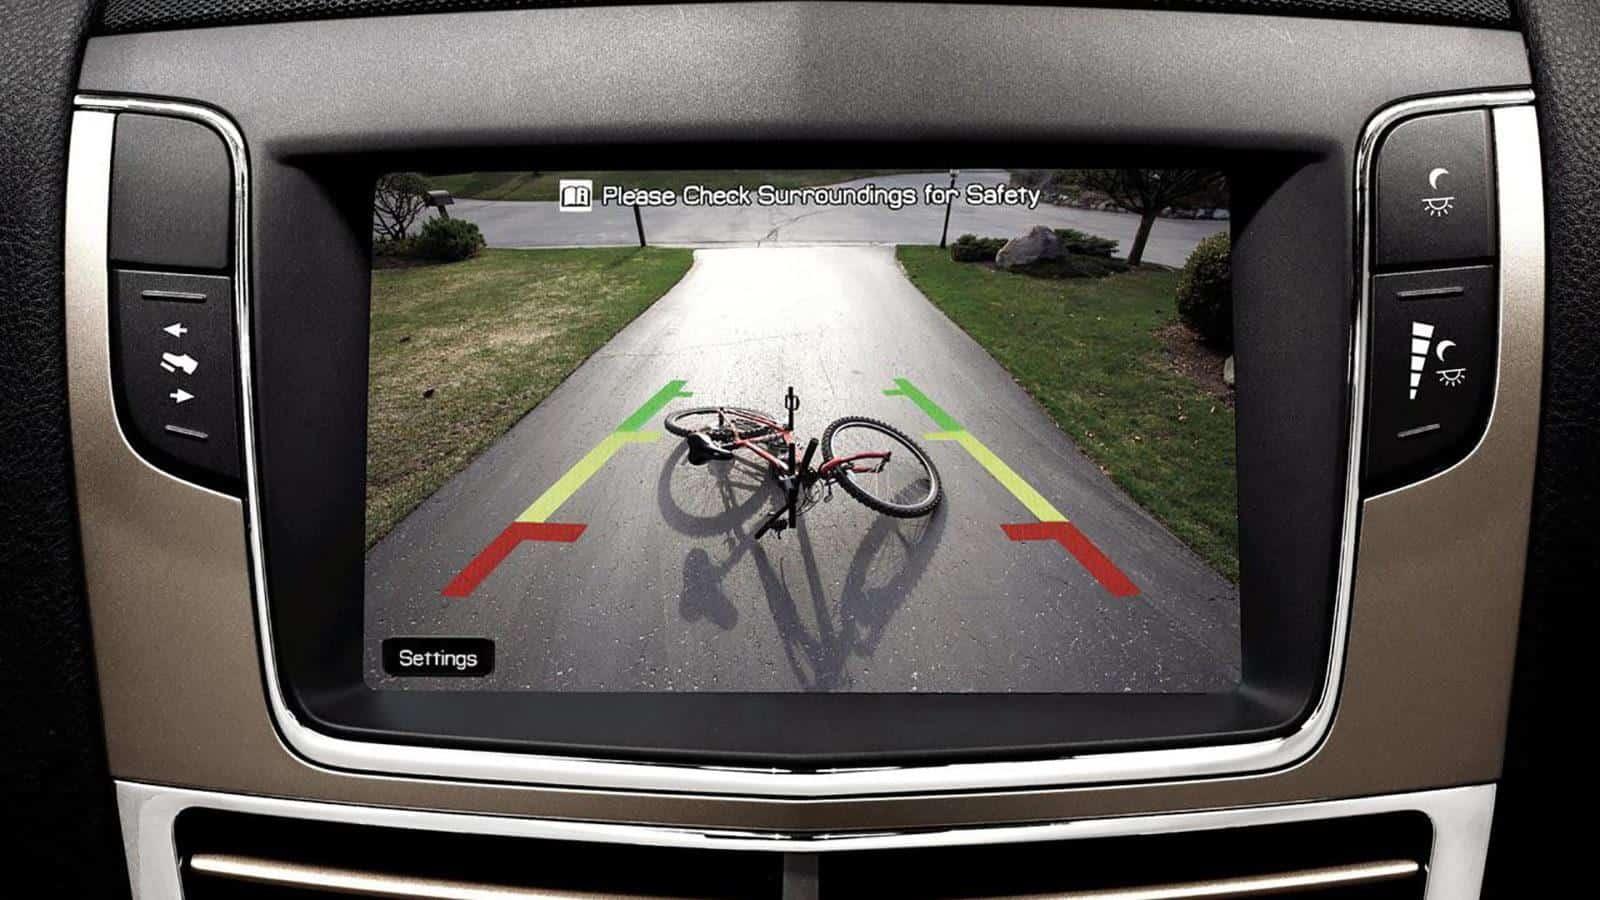 AR UI - Rear view AR camera